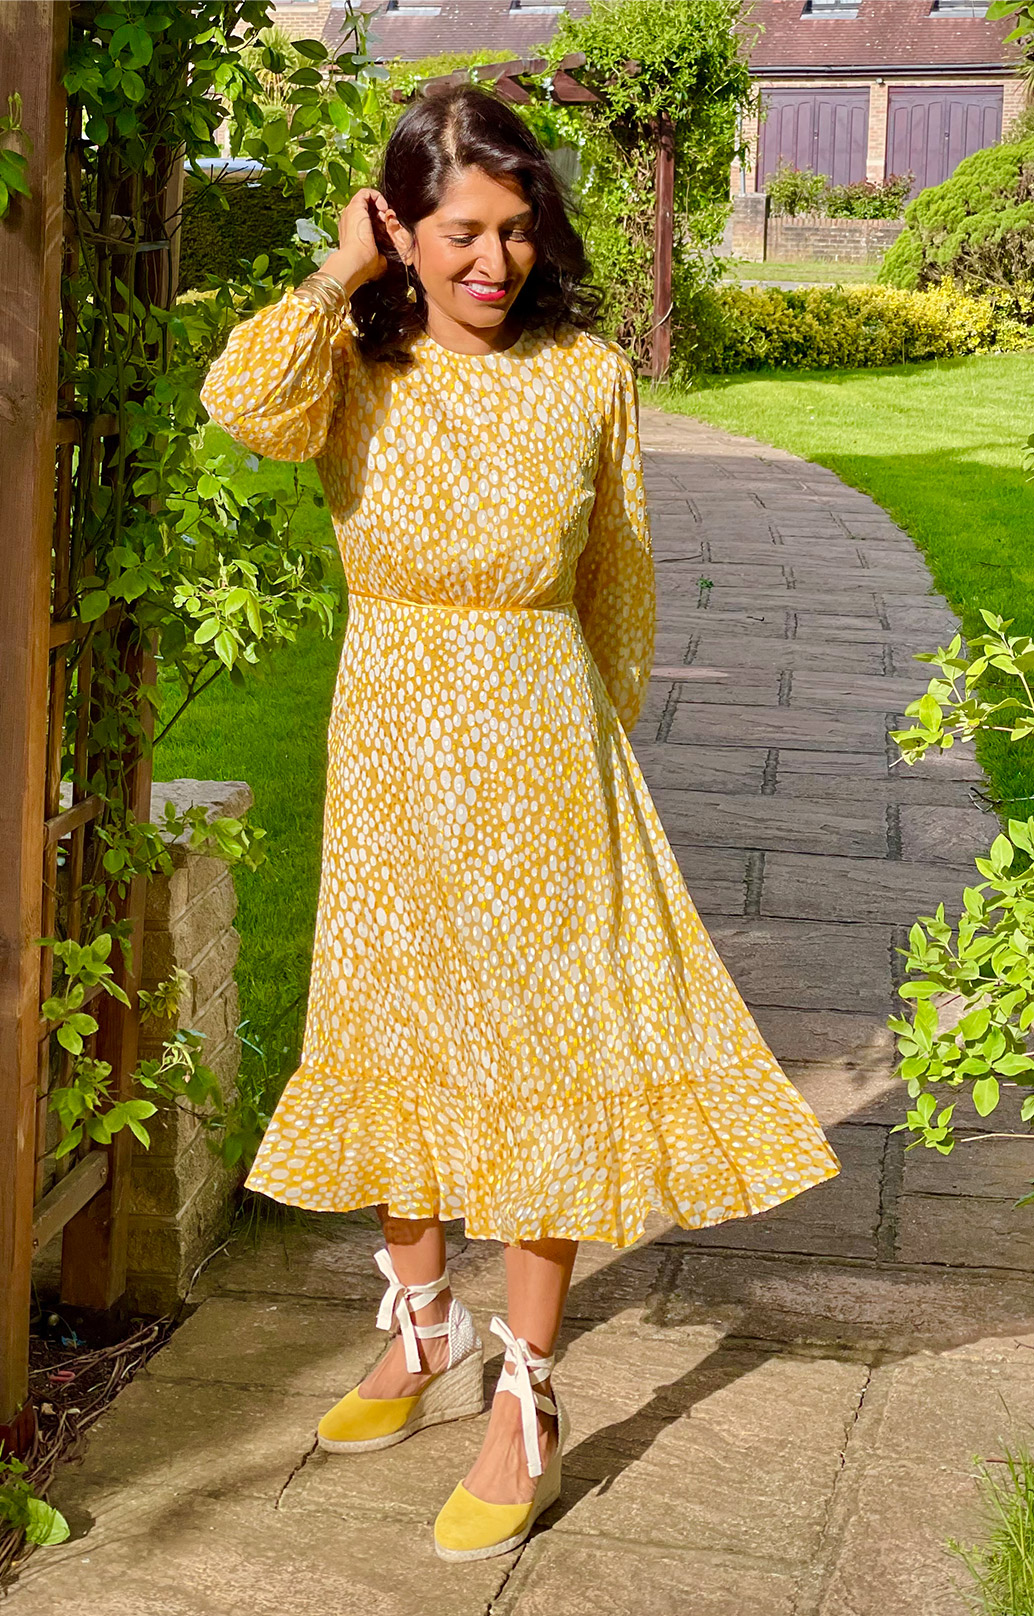 Fashion blogger @monikagoestowork photographed in her garden wearing Hobbs' Lexi yellow jacquard dress.